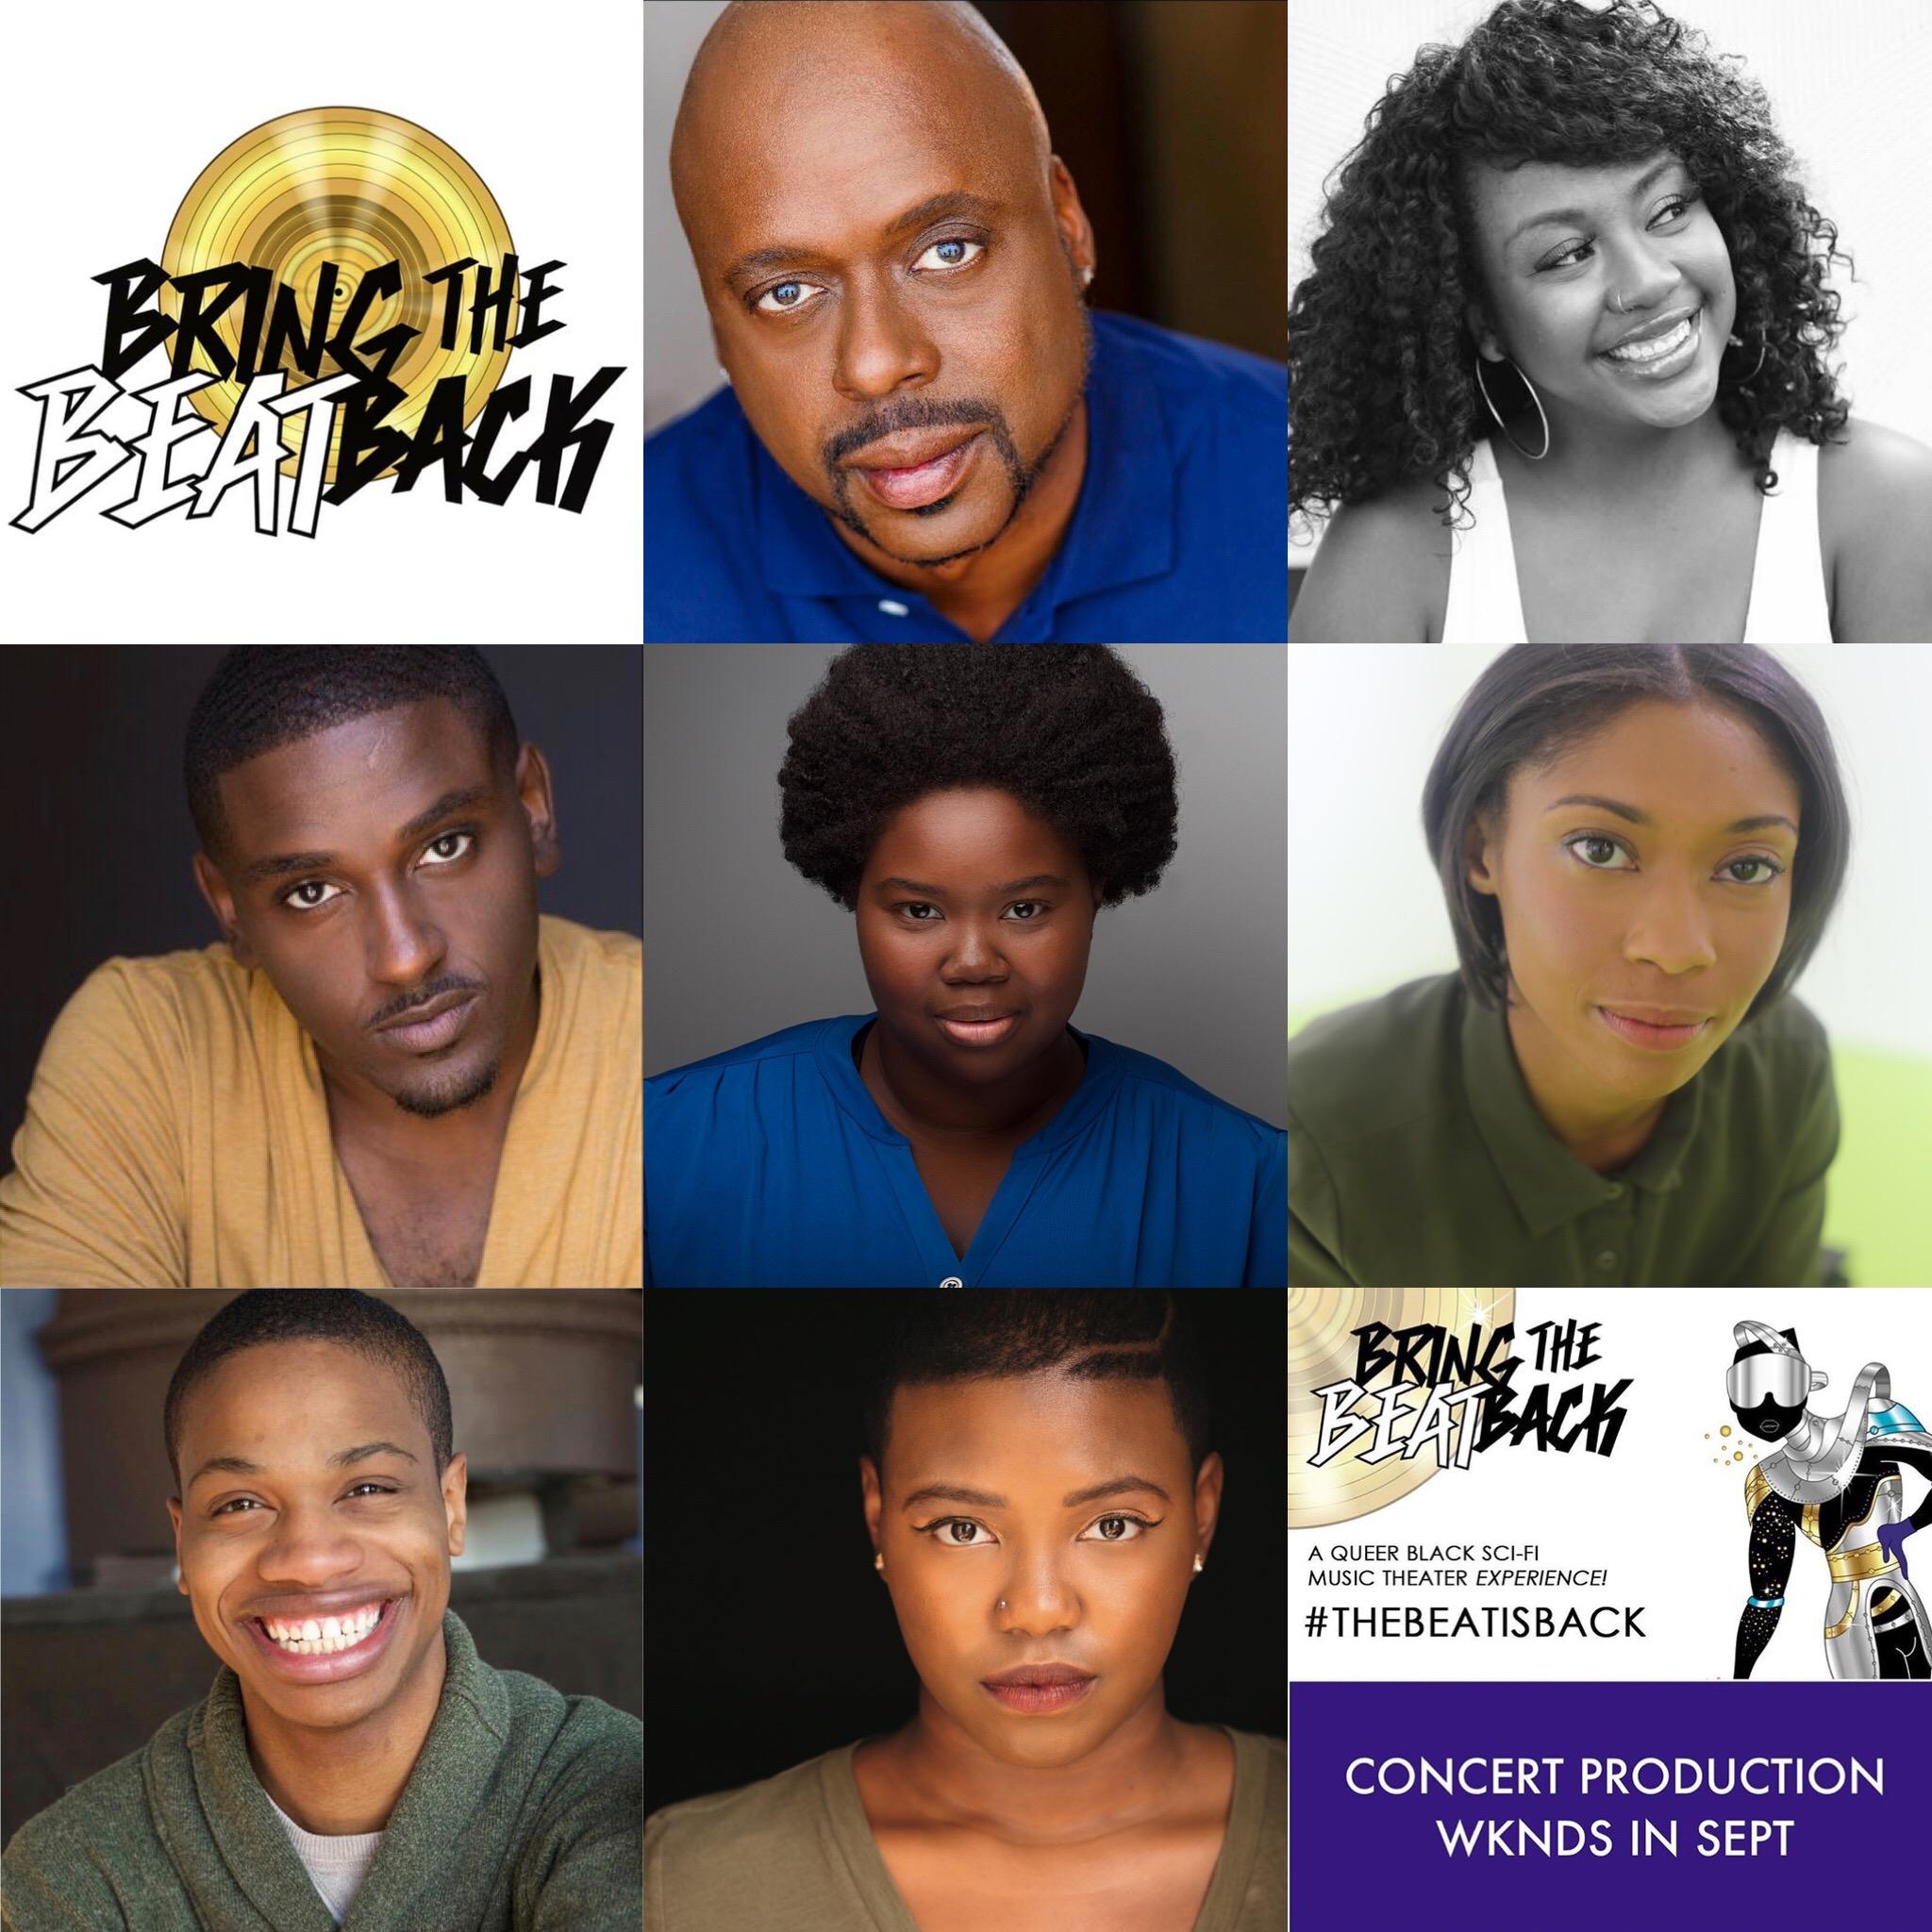 Our cast: Donald Fitzdarryl, Jasmine Marie Jones, Bernell Lassai, Dann R. Lynch, Tia Pinson, Donovan Session and Alexis Ward!